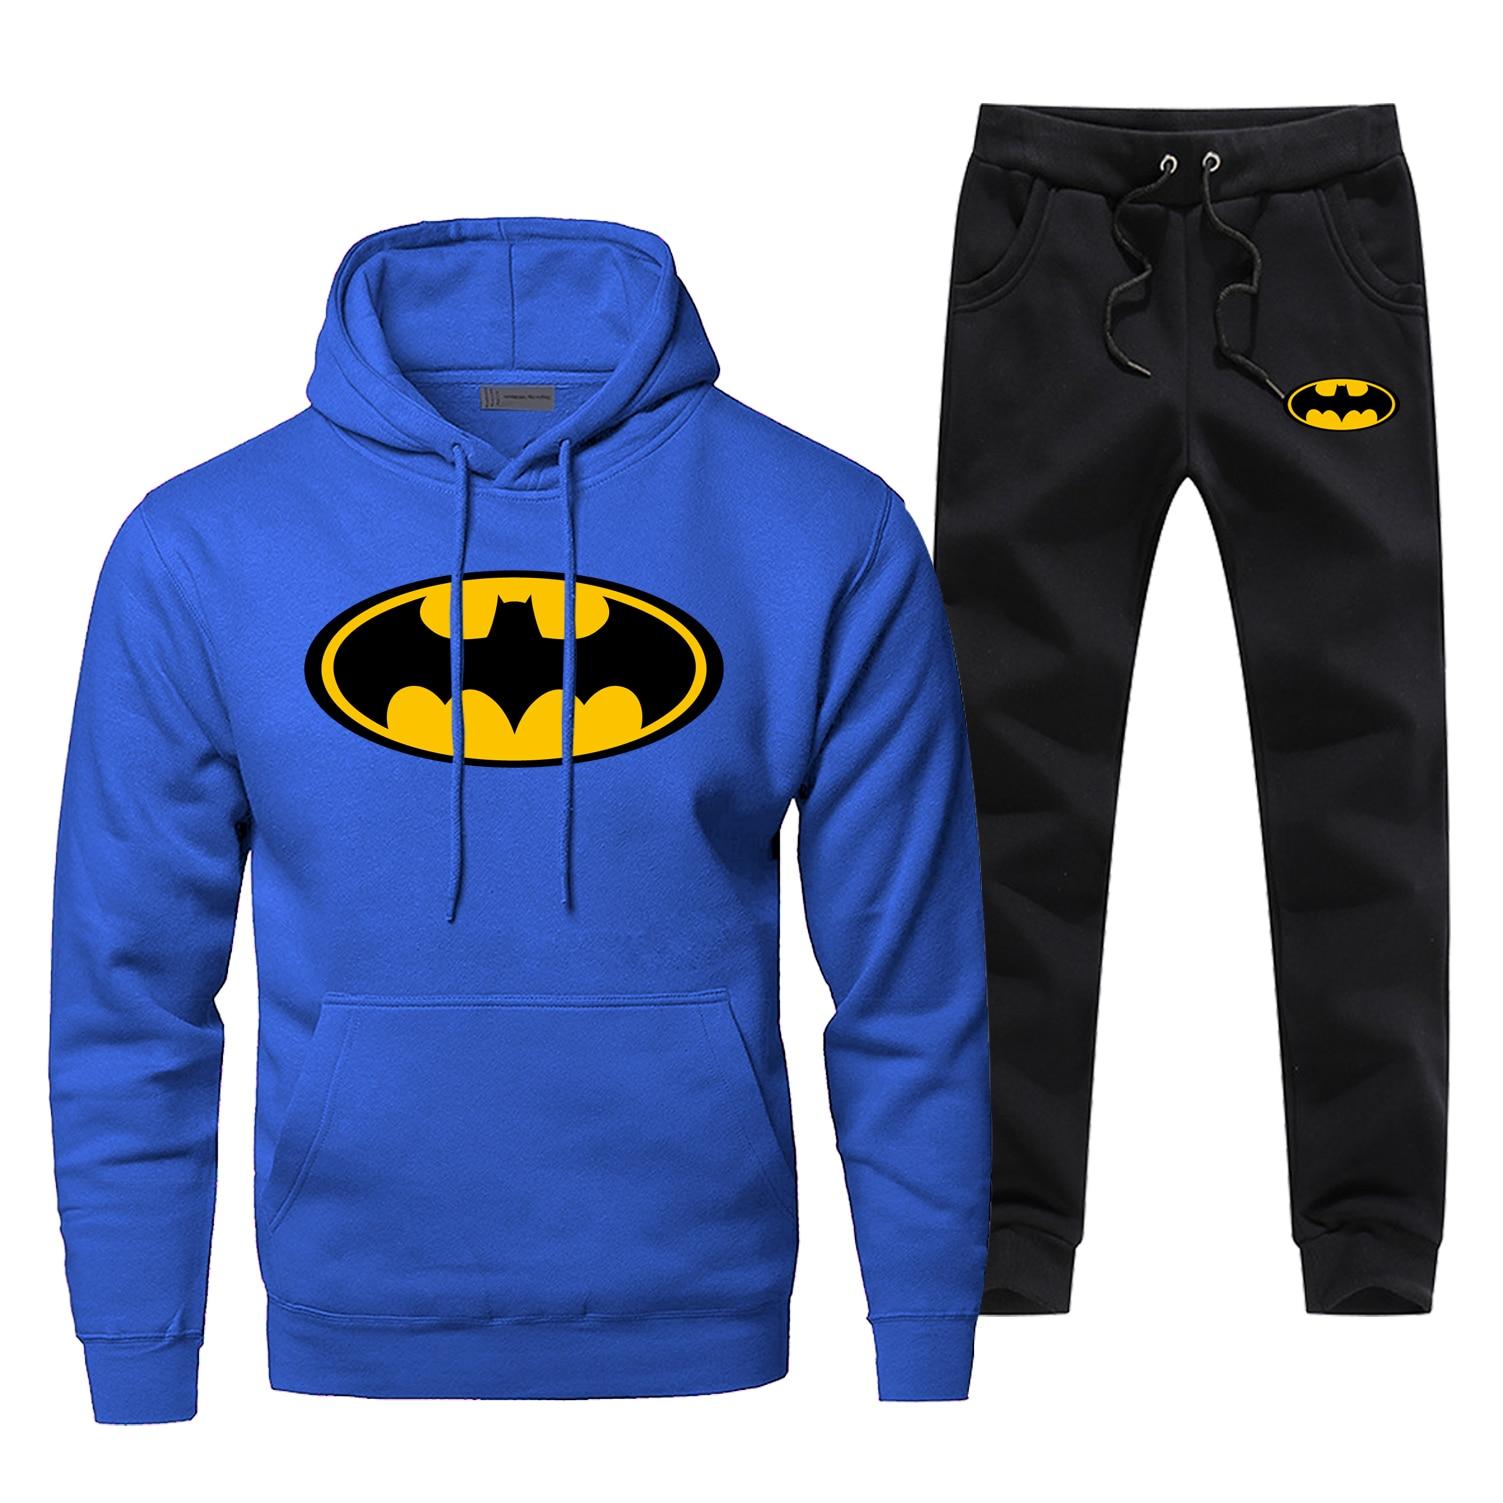 Batman Print Fashion Men's Full Suit Tracksuit Superhero Bat Man Sweatpants Hoodies For Men 2 Piece Set Fitness Warm Streetwear